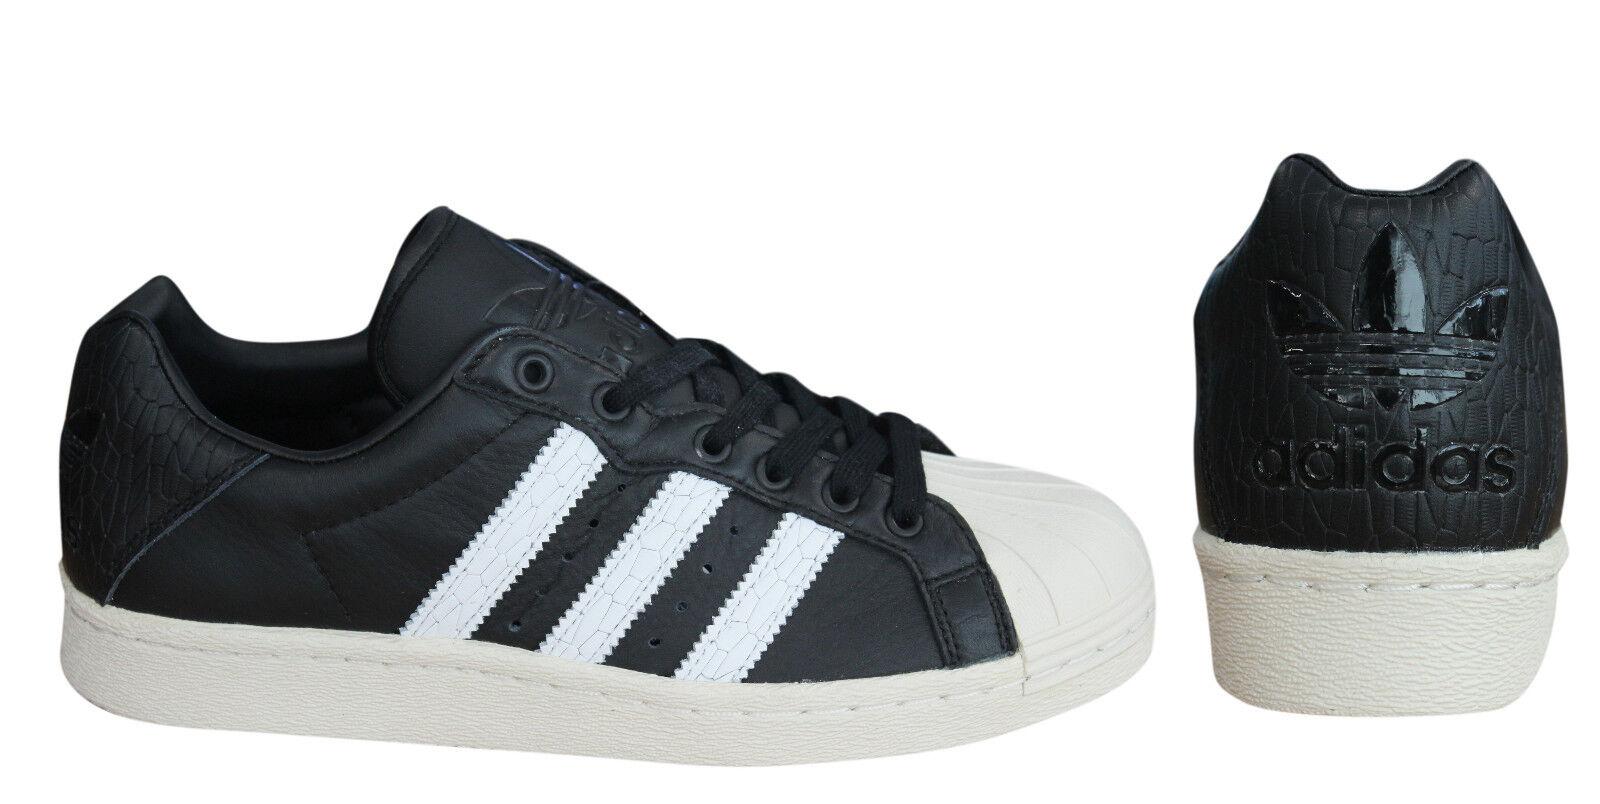 Adidas ultrastar 80 uomini allacciarsi le scarpe di pelle bianca, bianca, pelle i neri bb0172 u14 407718